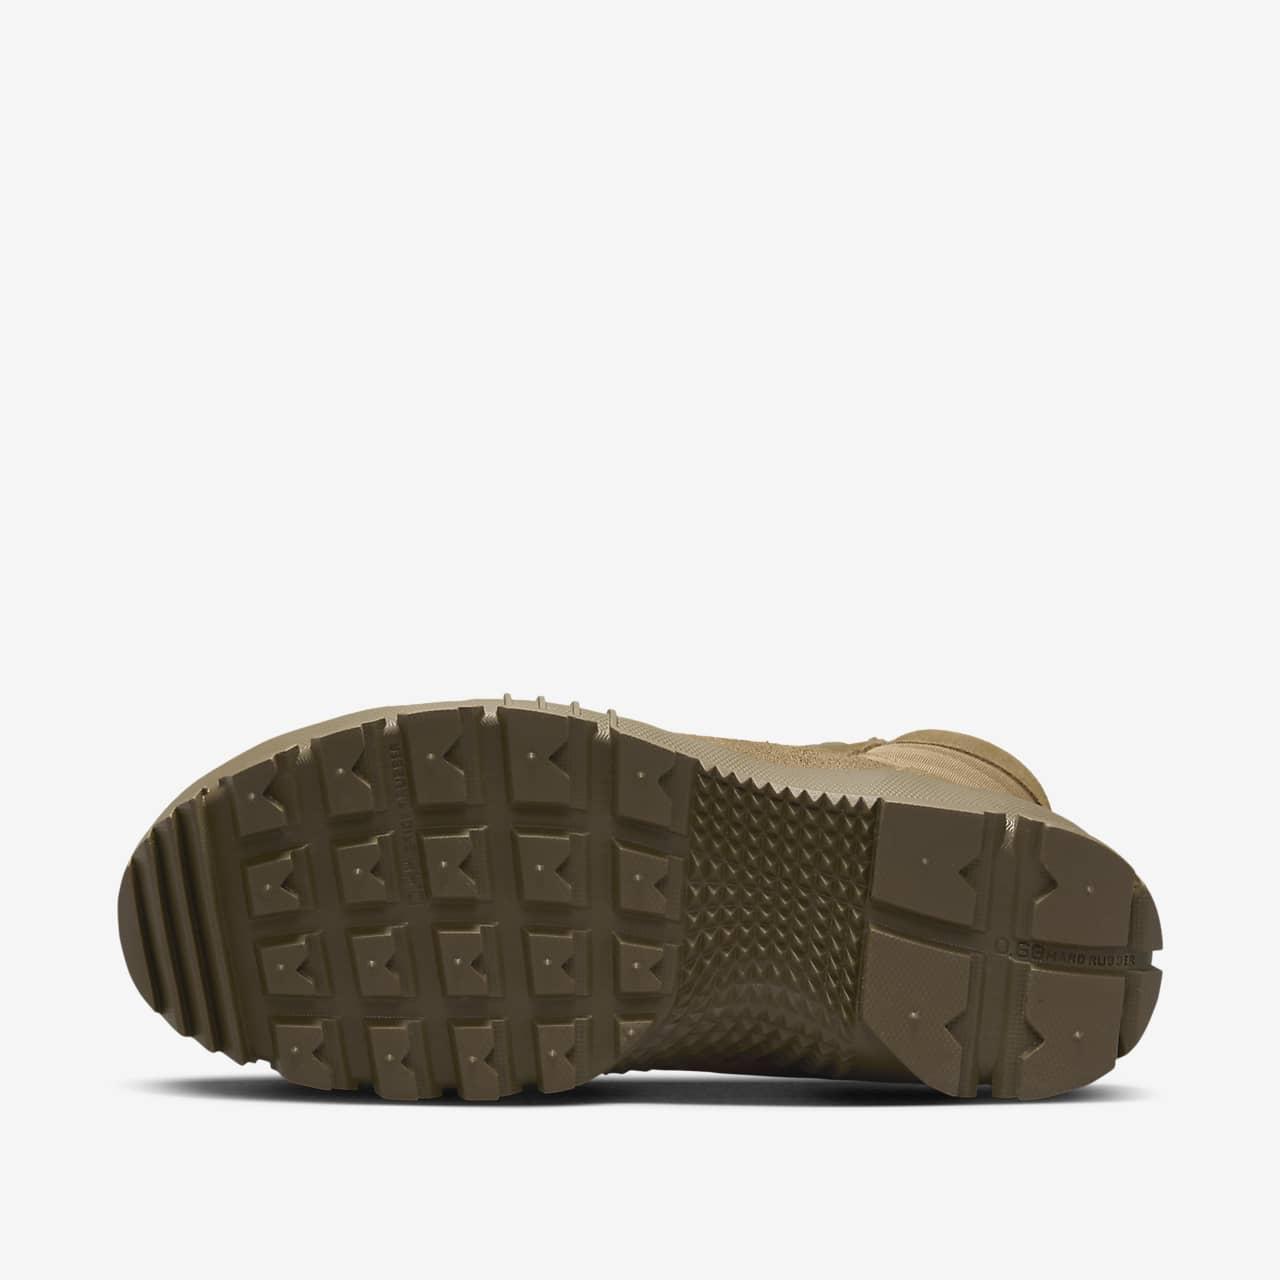 ede2c0a106504 Nike SFB Jungle 8